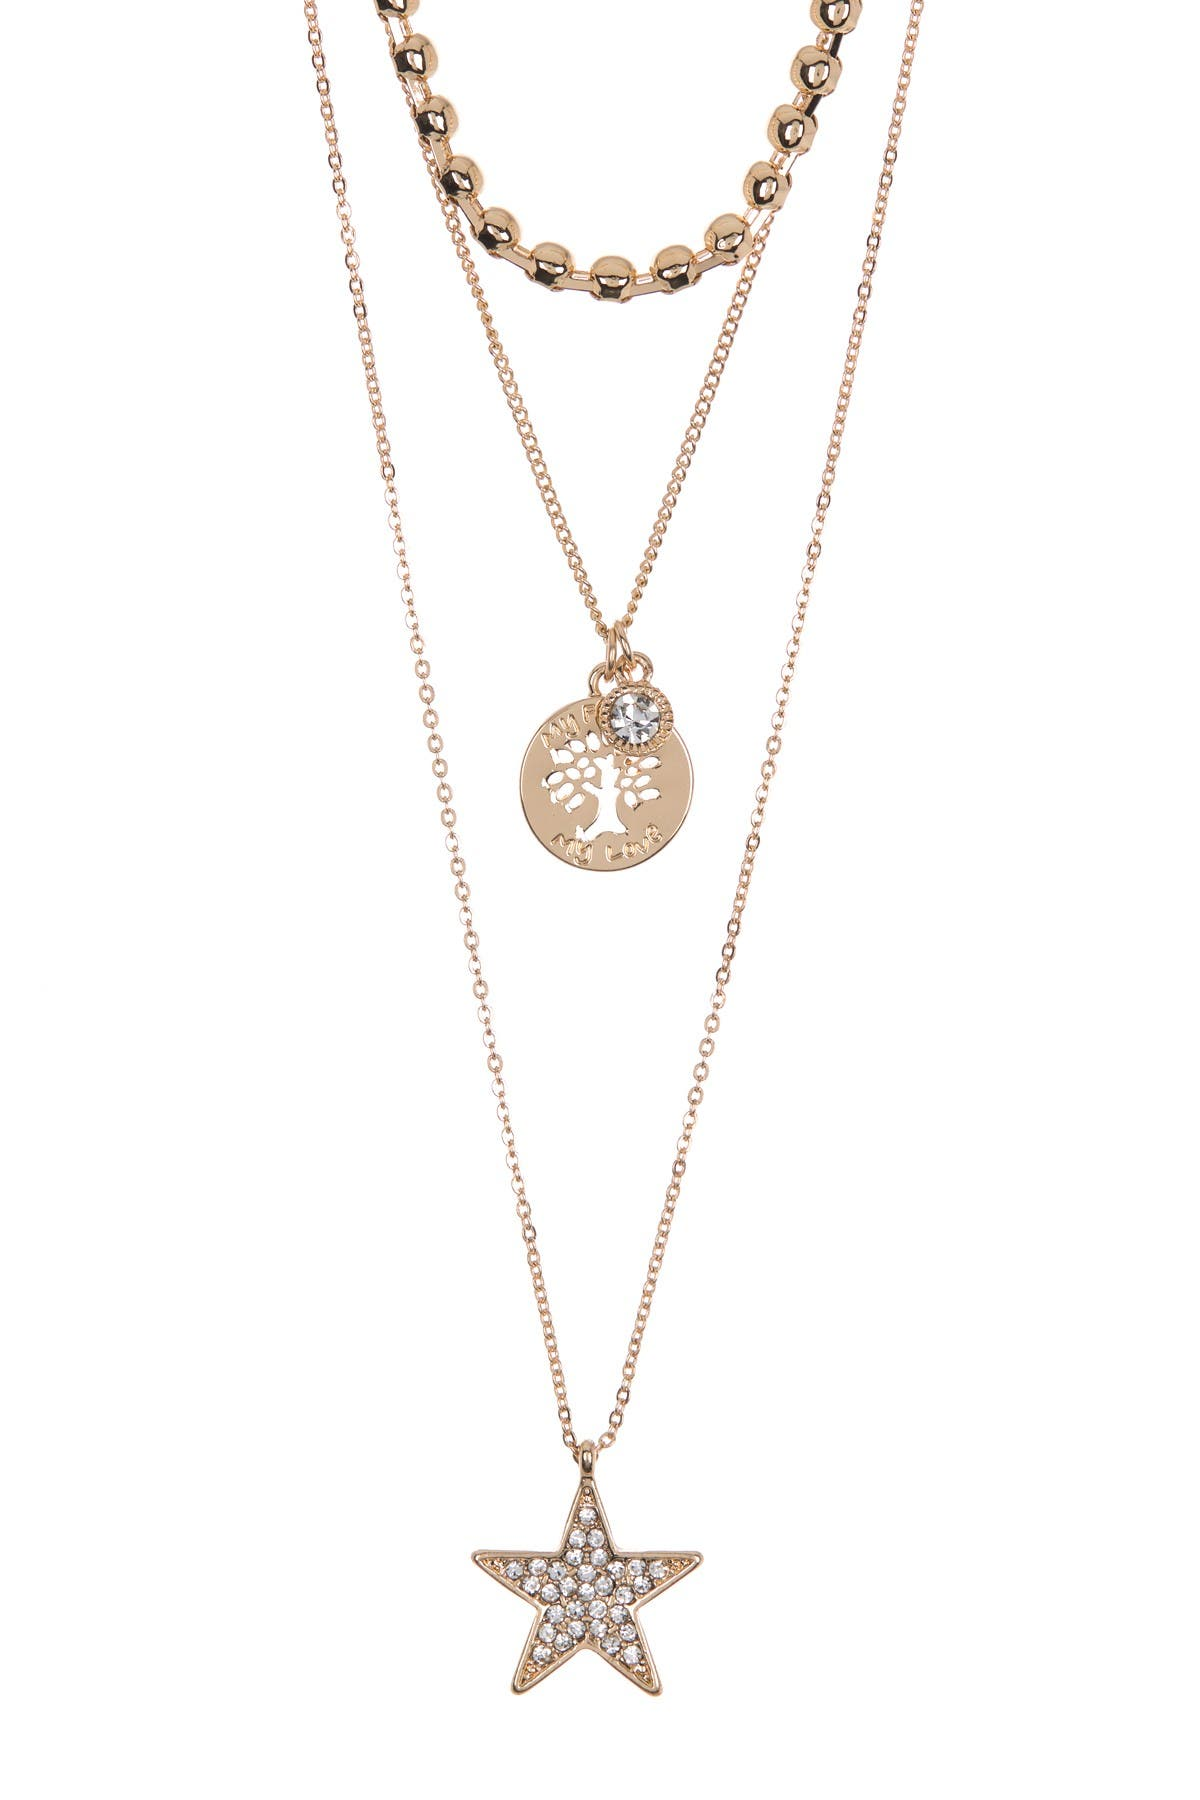 Image of AREA STARS Star & Tree Layered Pendant Necklace Set